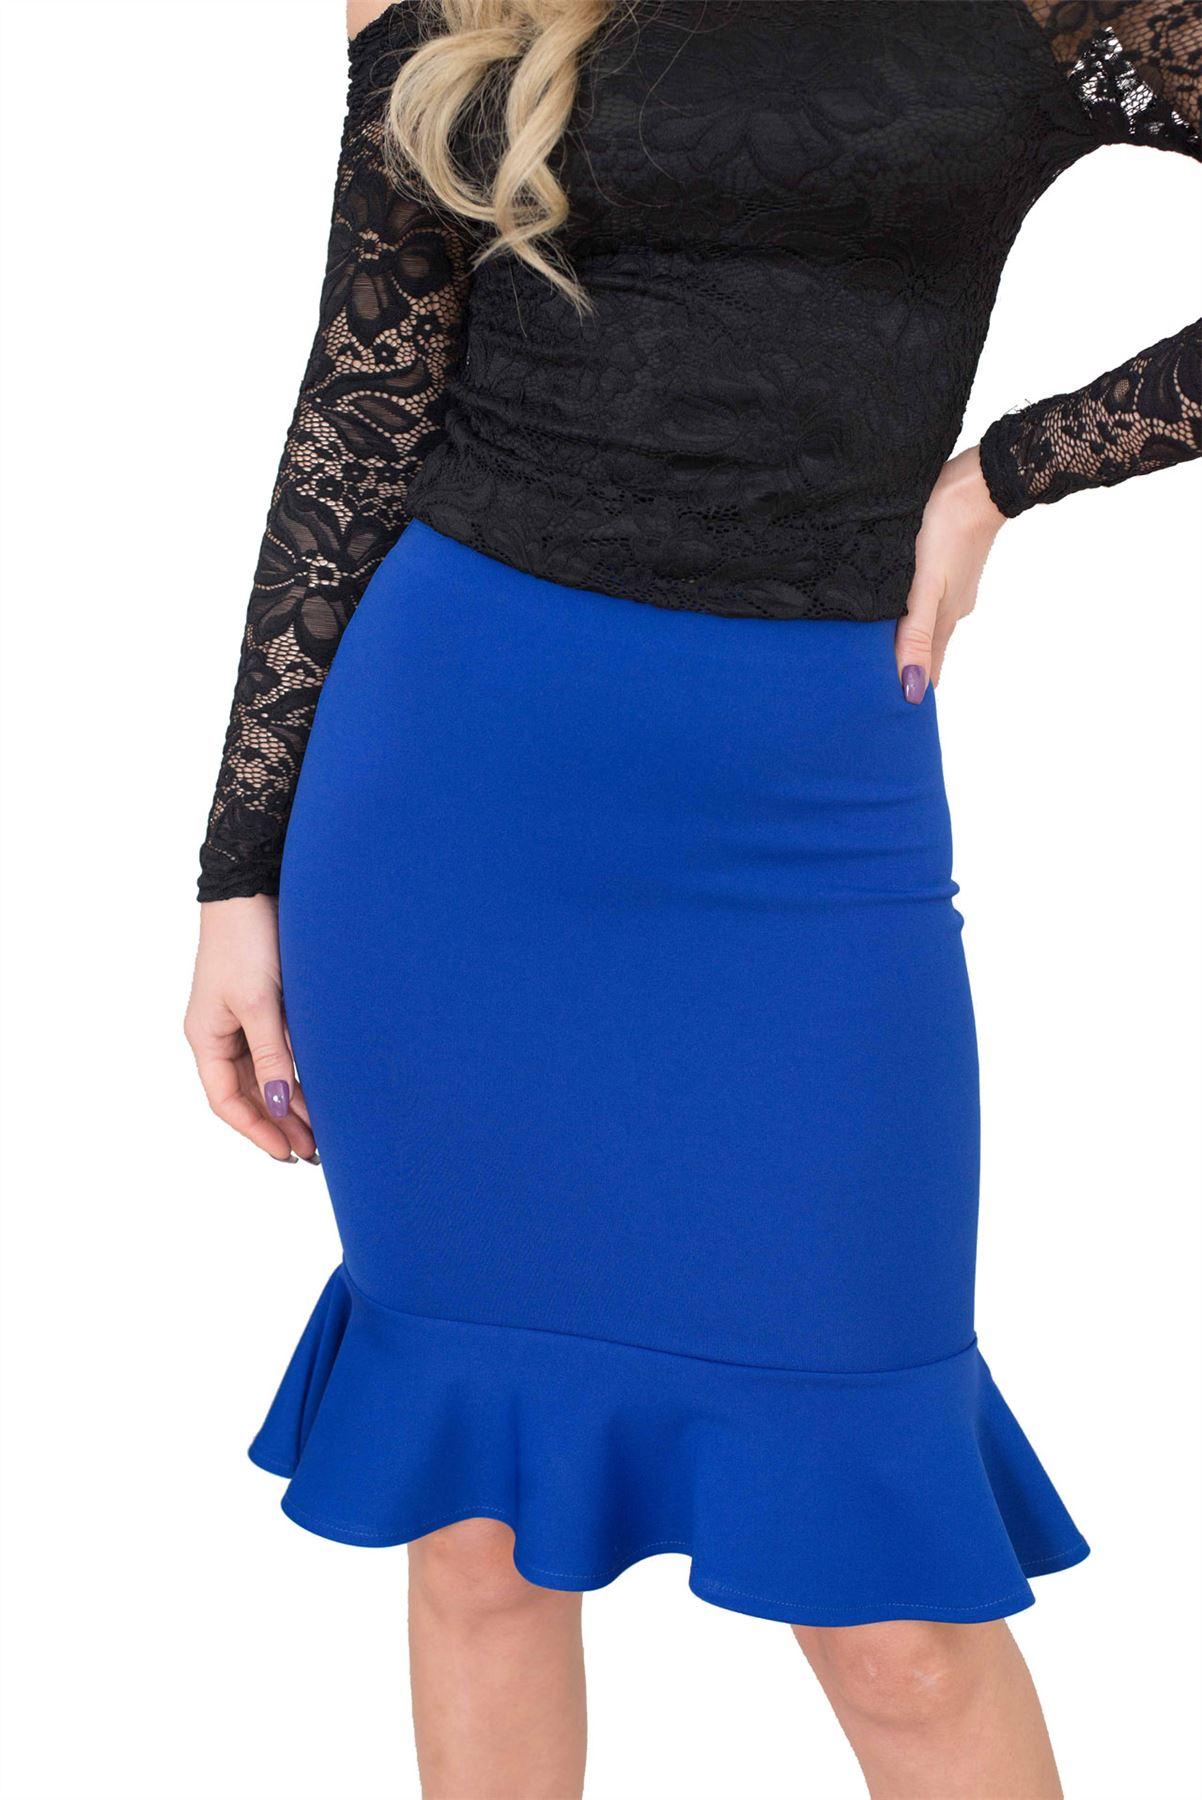 Jolie Max Women Fishtail Pencil Skirt Midi Stretch Bodycon Size8 16 Clothing Georgia Mini Dress